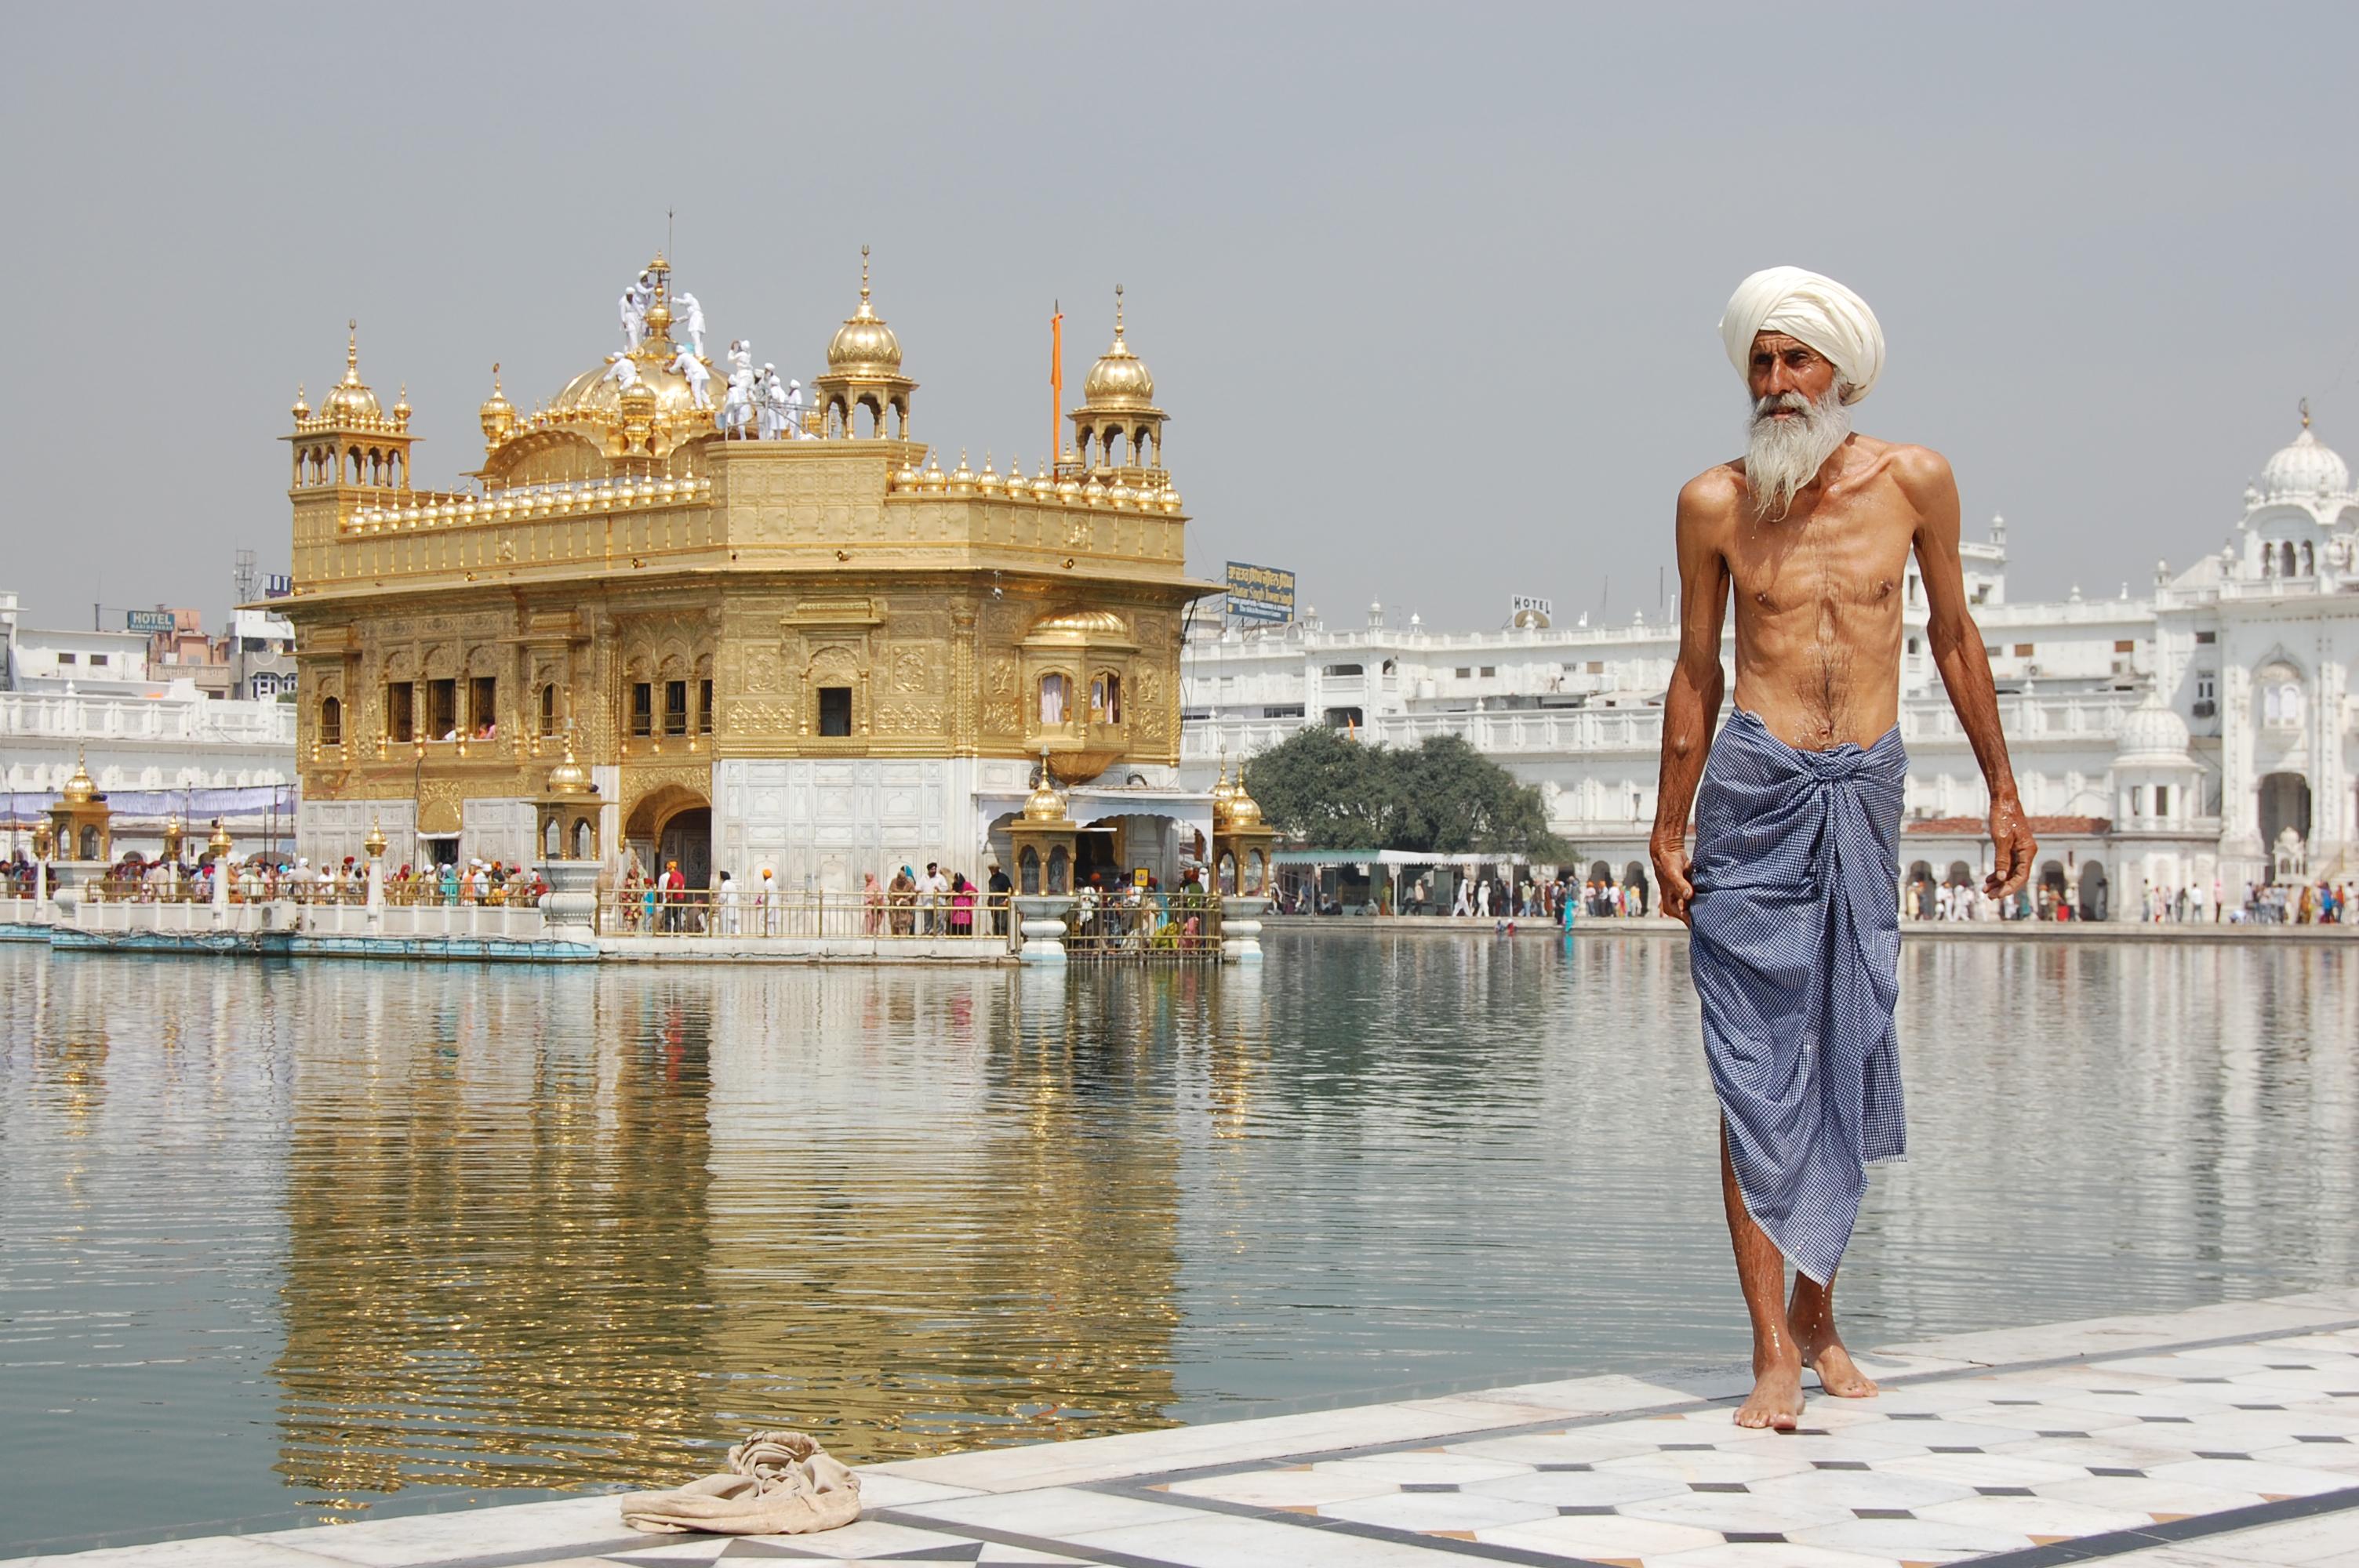 file:sikh pilgrim at the golden temple (harmandir sahib) in amritsar